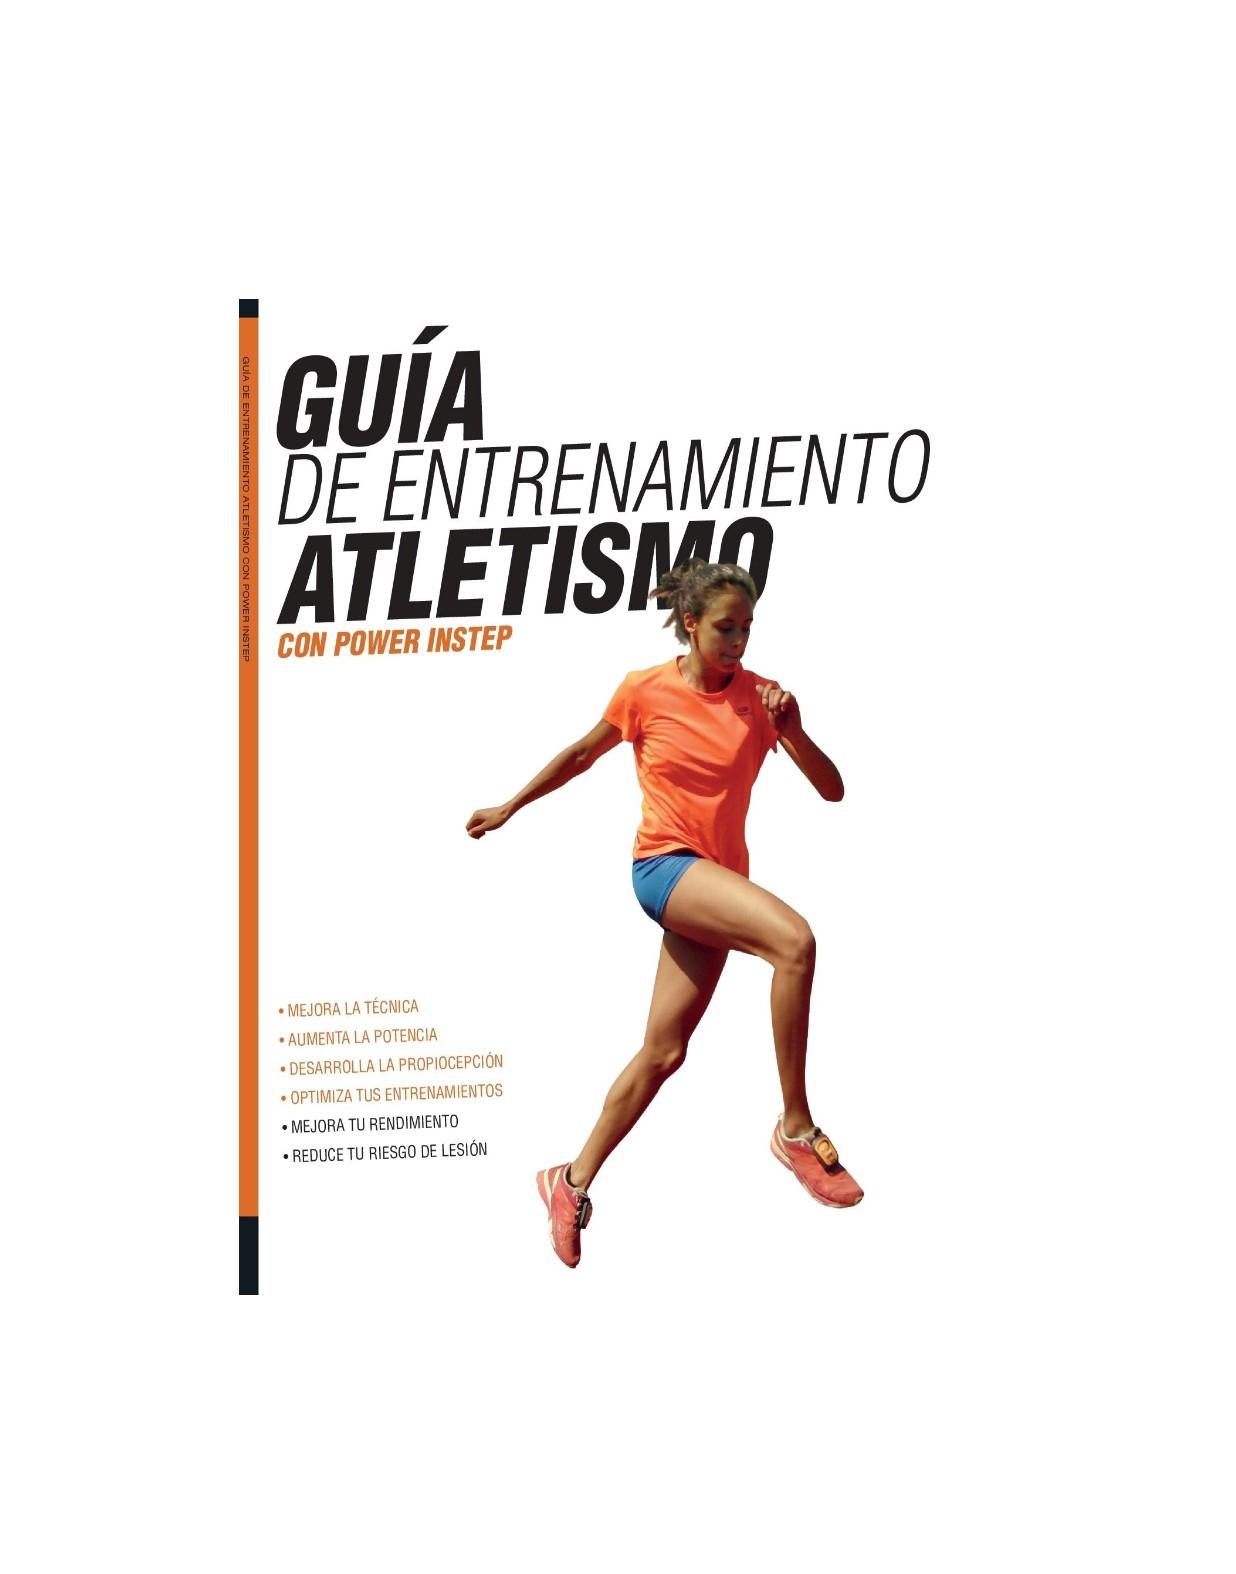 Guia%2batletismo%2bbolsillo2